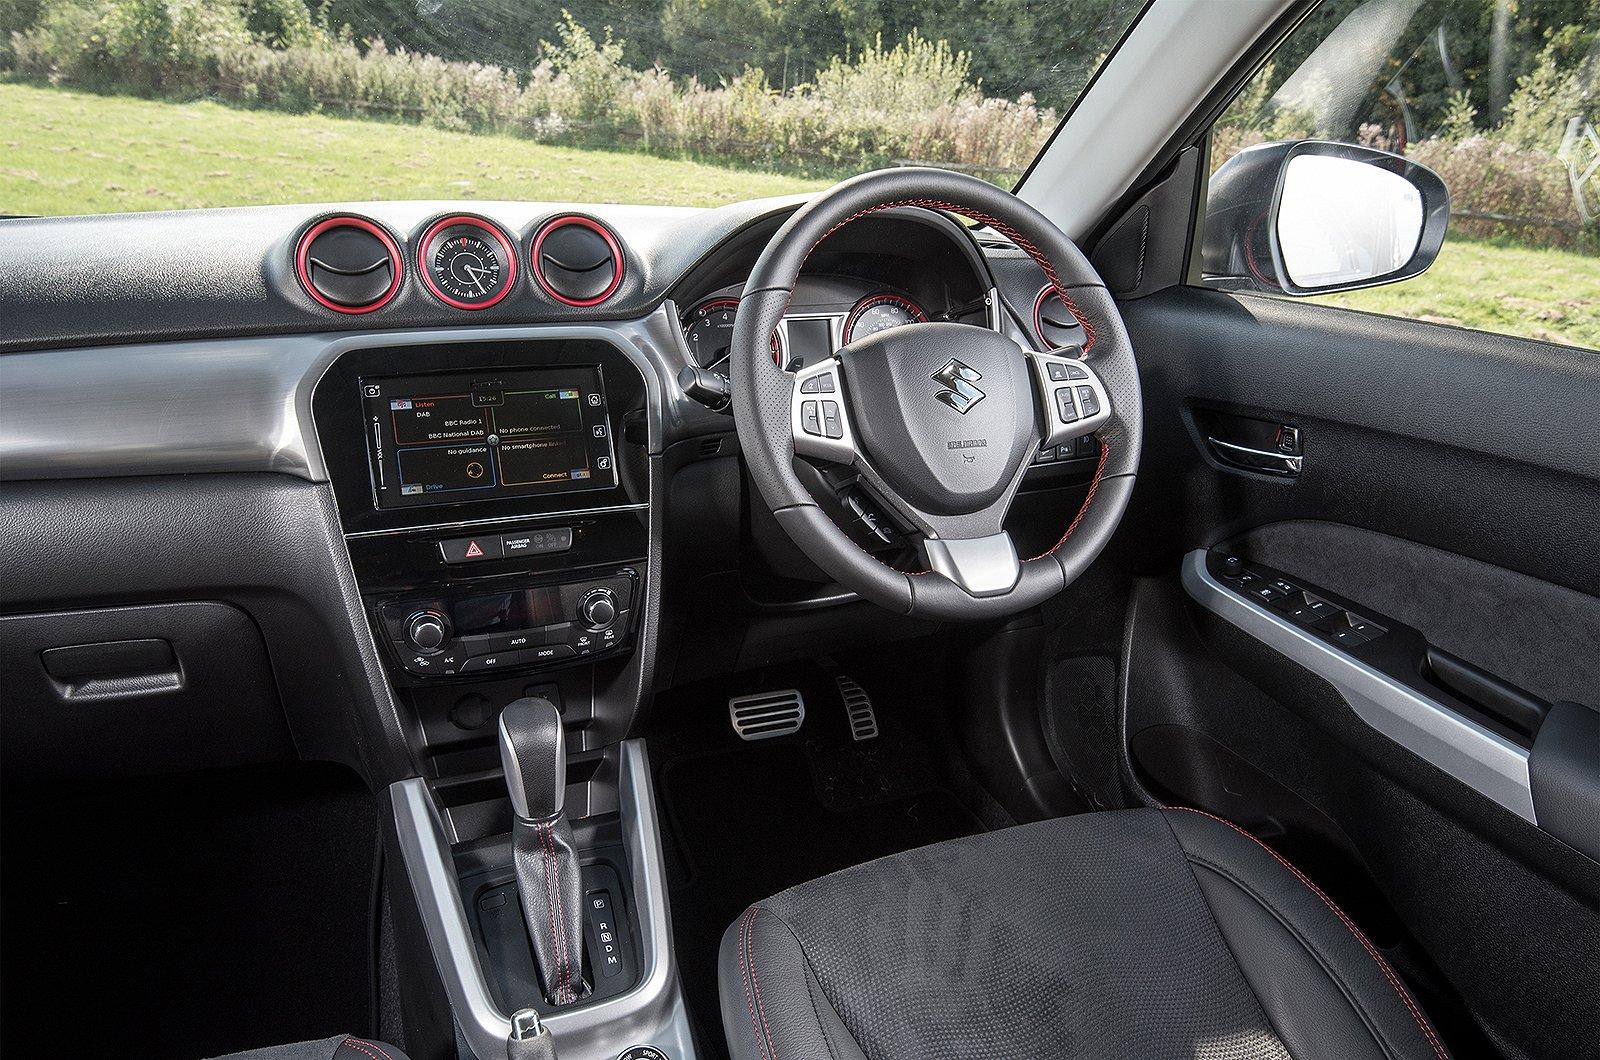 Suzuki Vitara 1.4 Boosterjet SZ5 Allgrip auto - interior